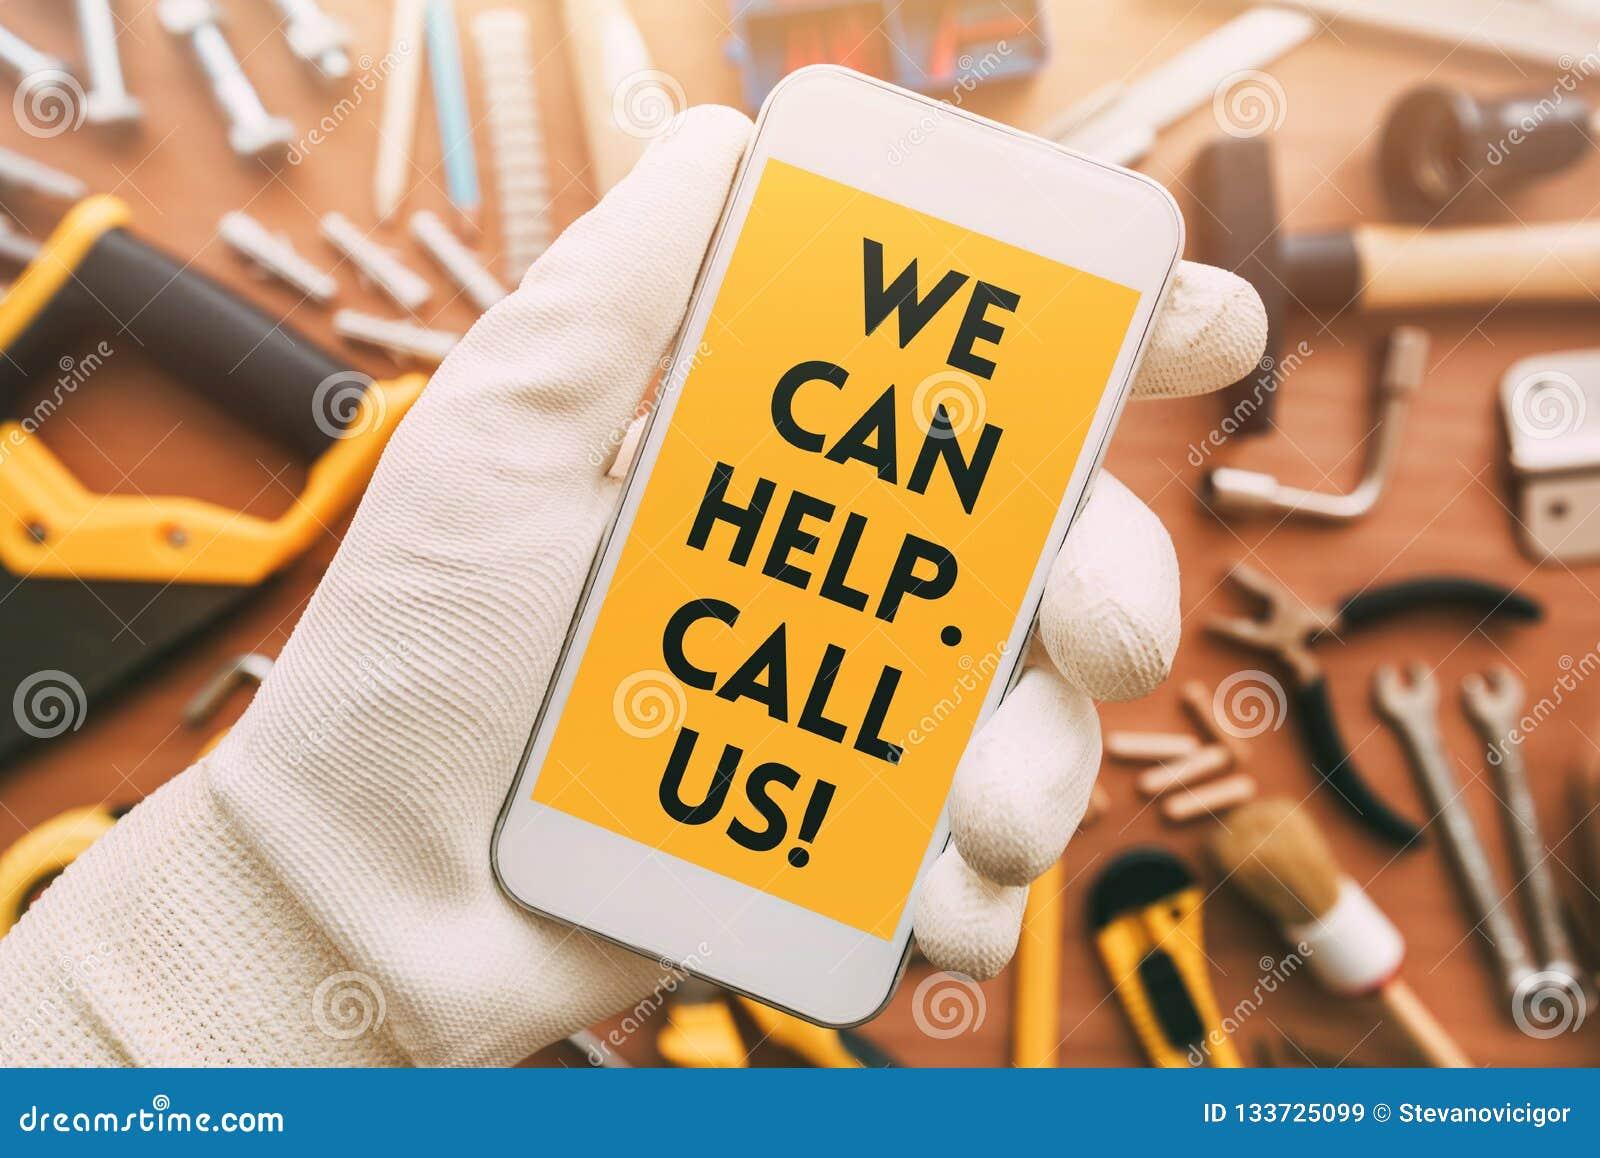 Handyman Smart Phone App Contact Message Stock Image - Image